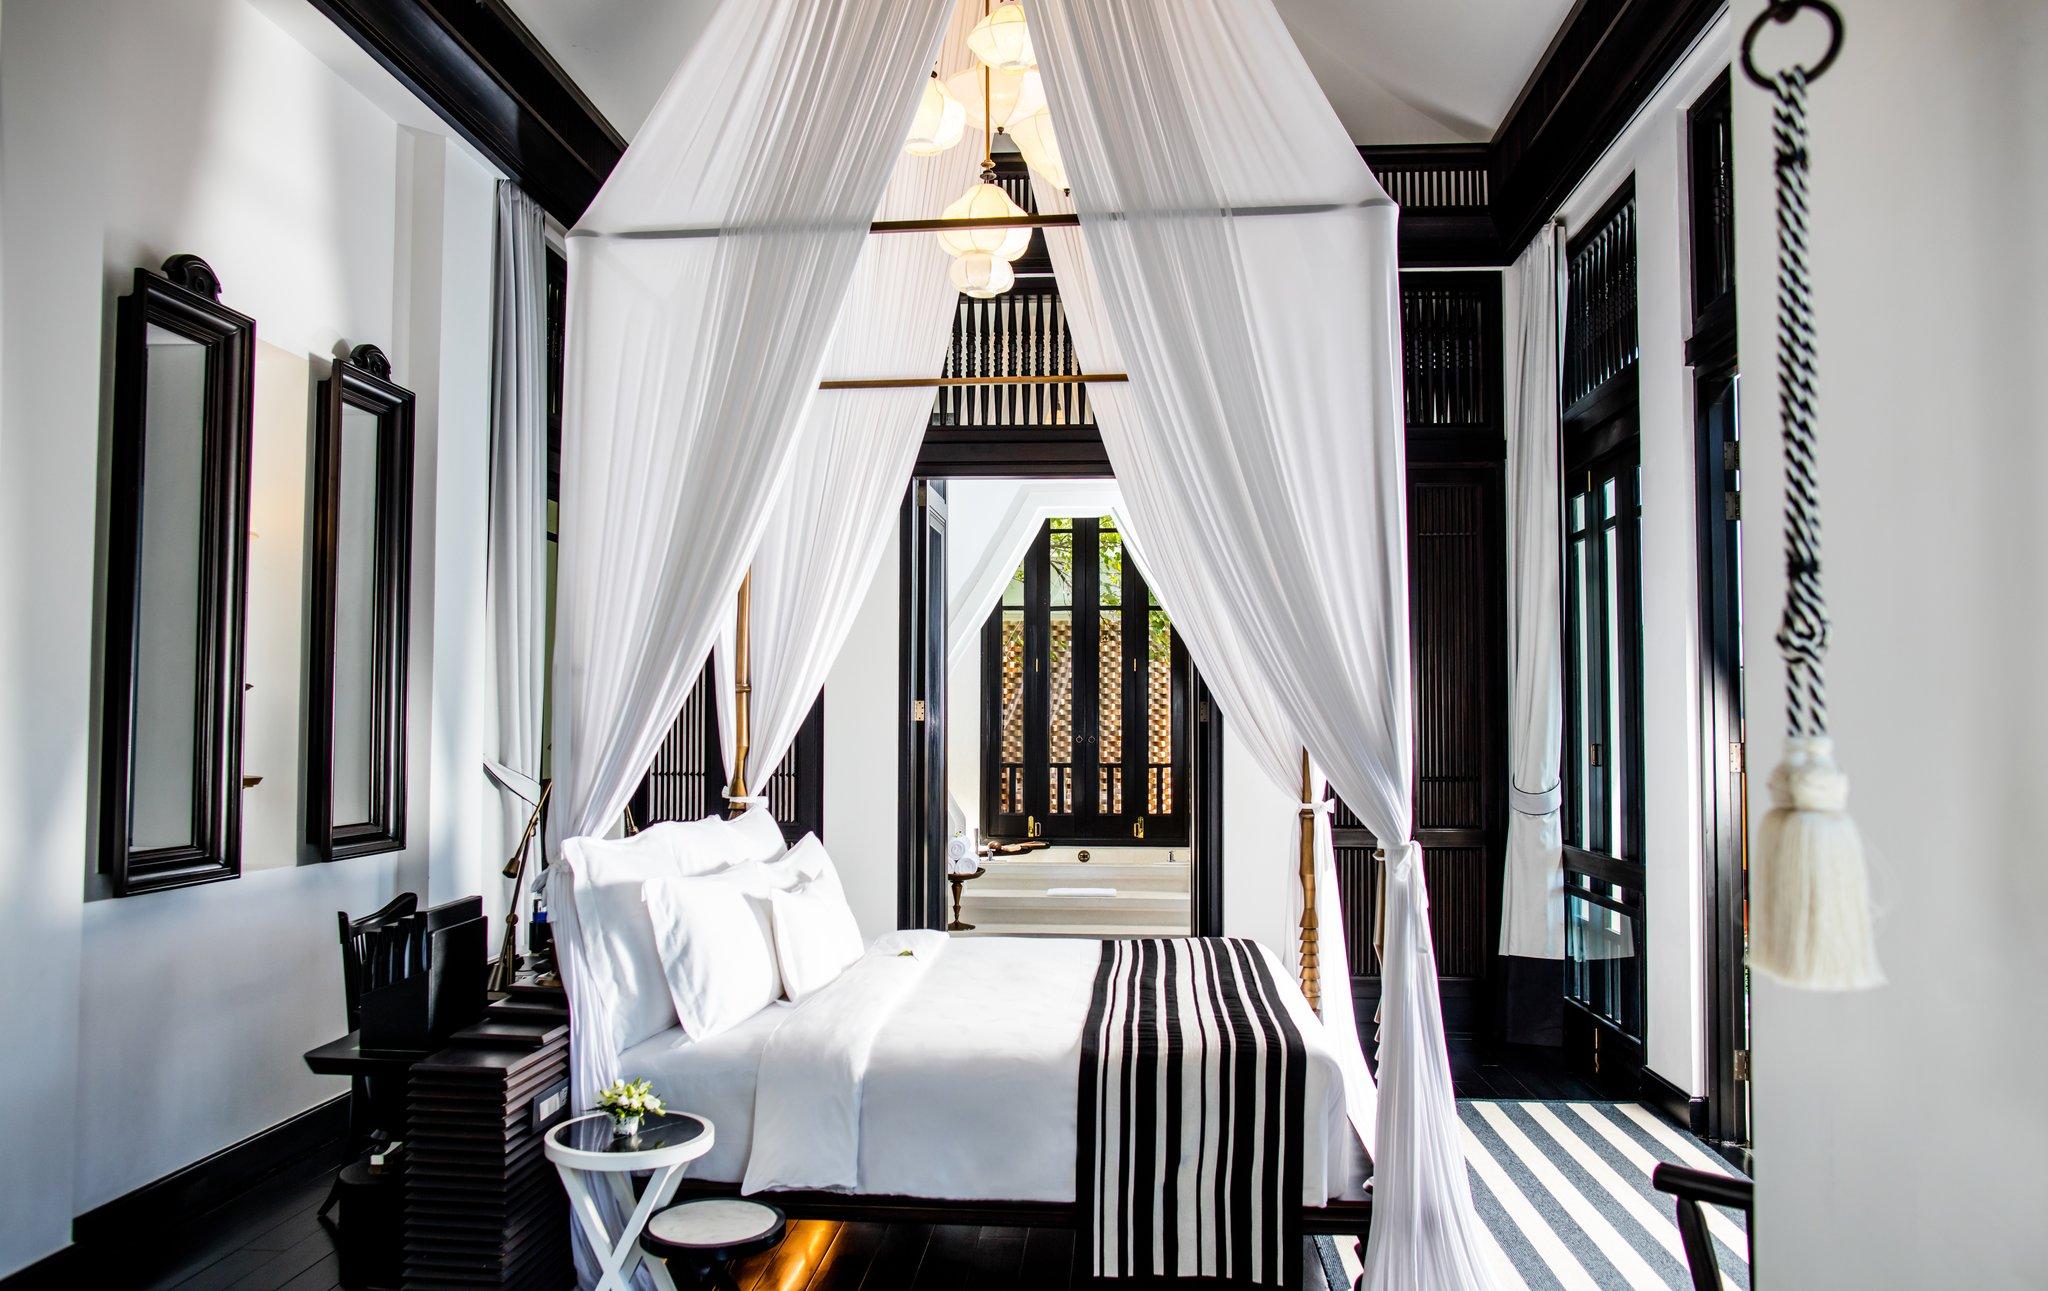 Destination Wedding at InterContinental Danang Sun Peninsula Resort